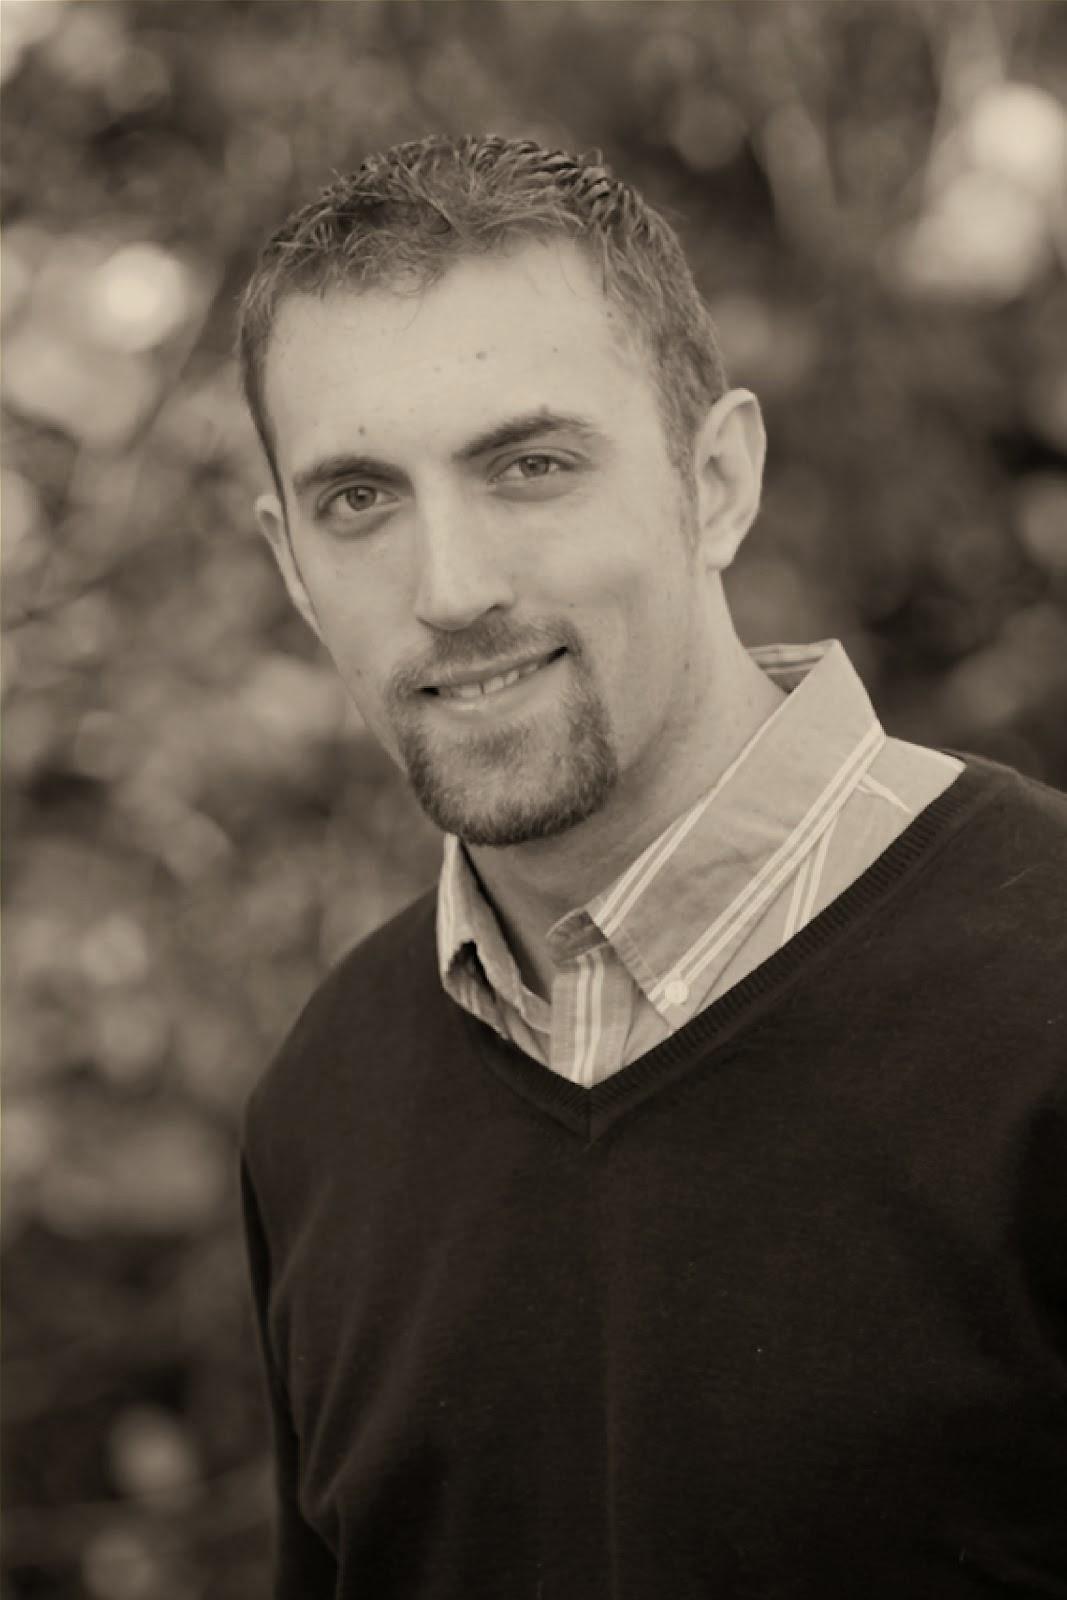 Nate Worrell